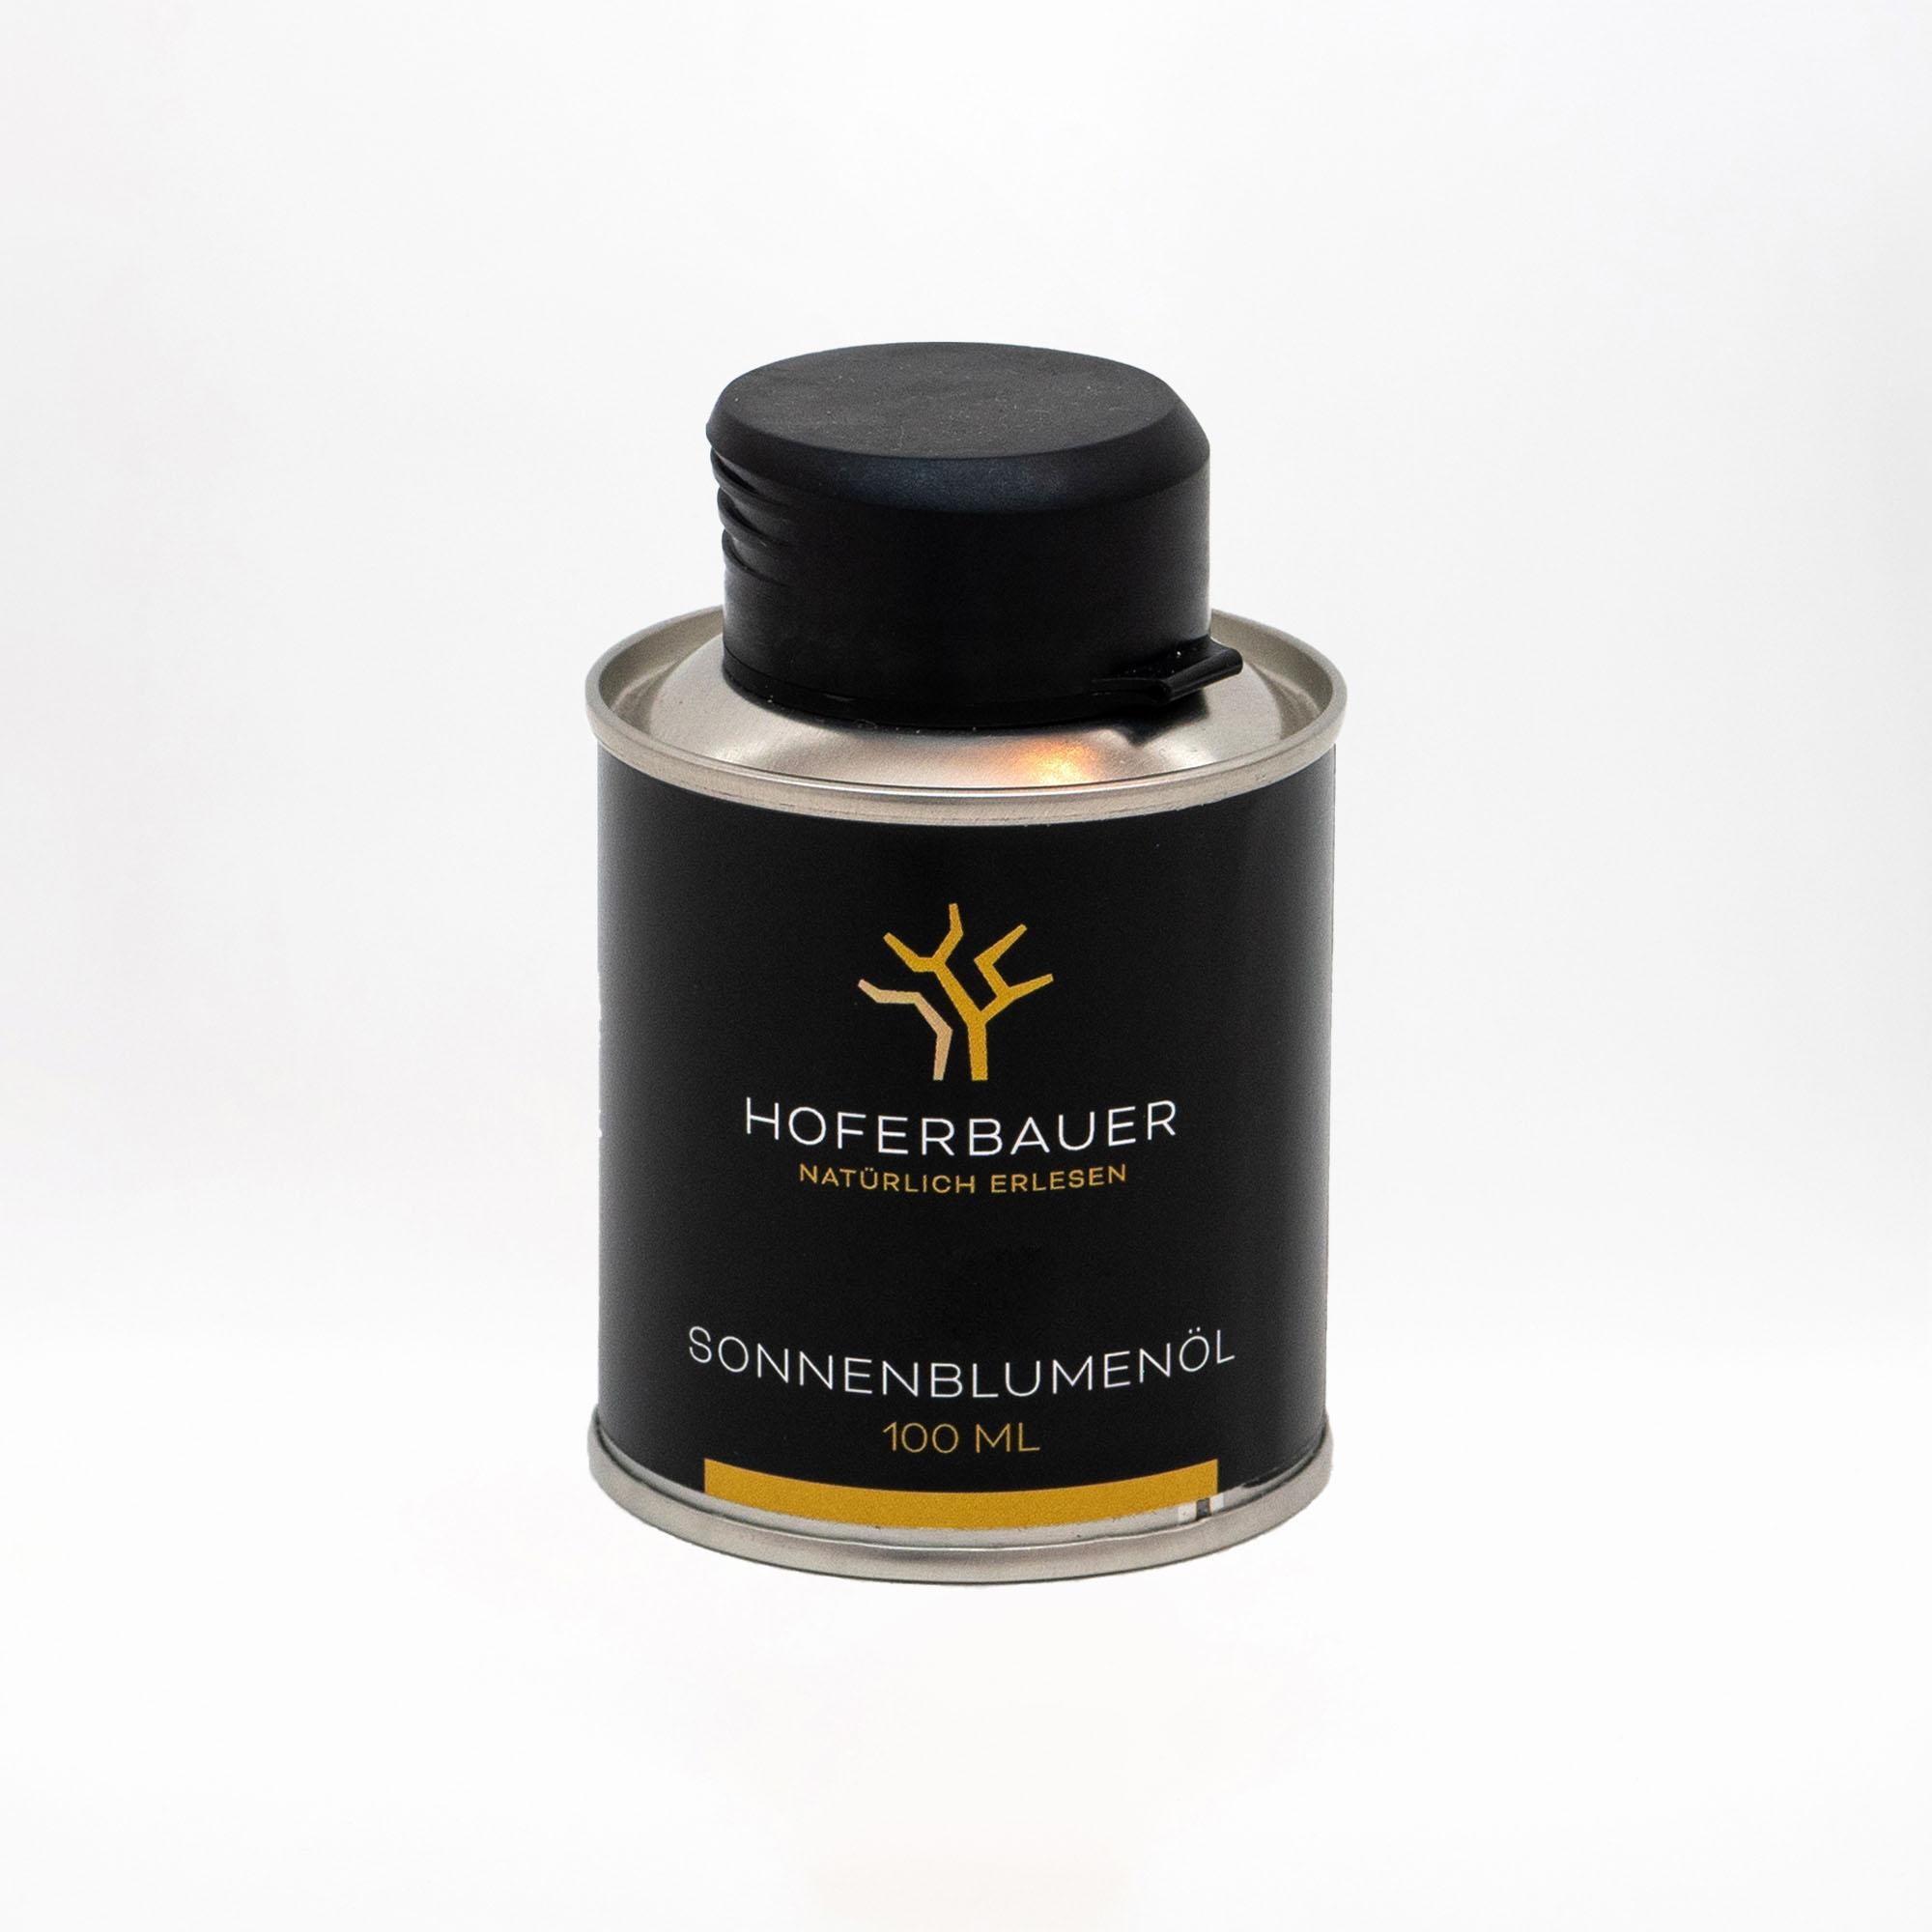 Sonnenblumenöl (U-Ware)